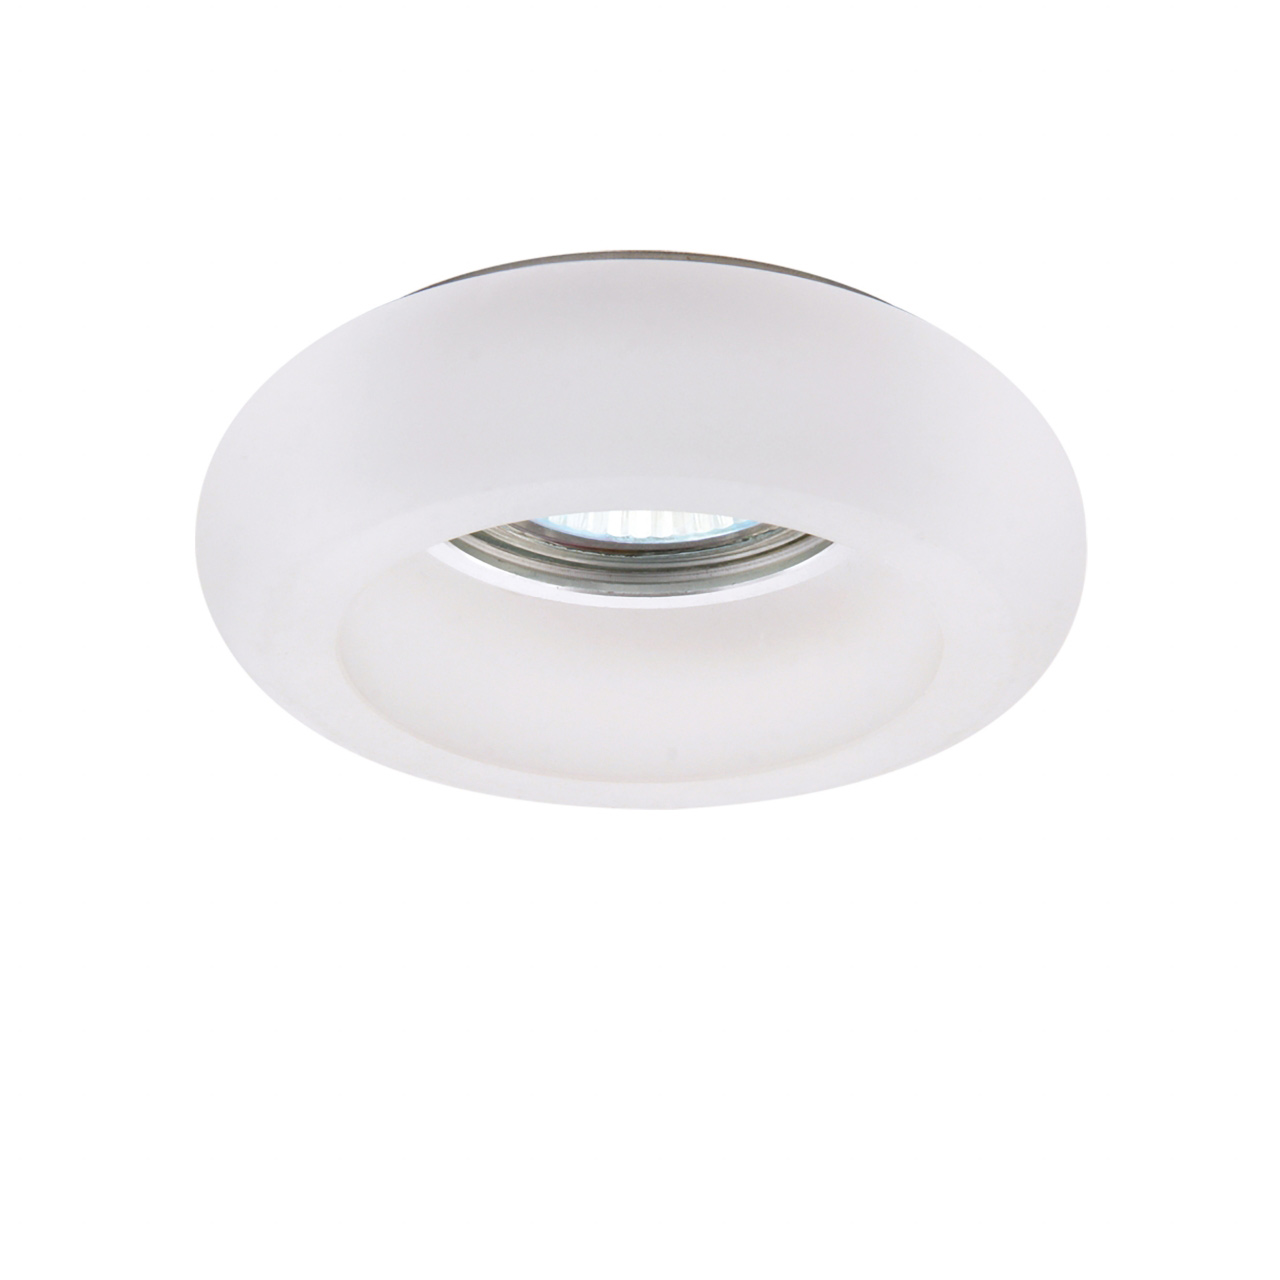 Светильник Tondo OPACO MR16 / HP16 хром / матовый Lightstar 006201